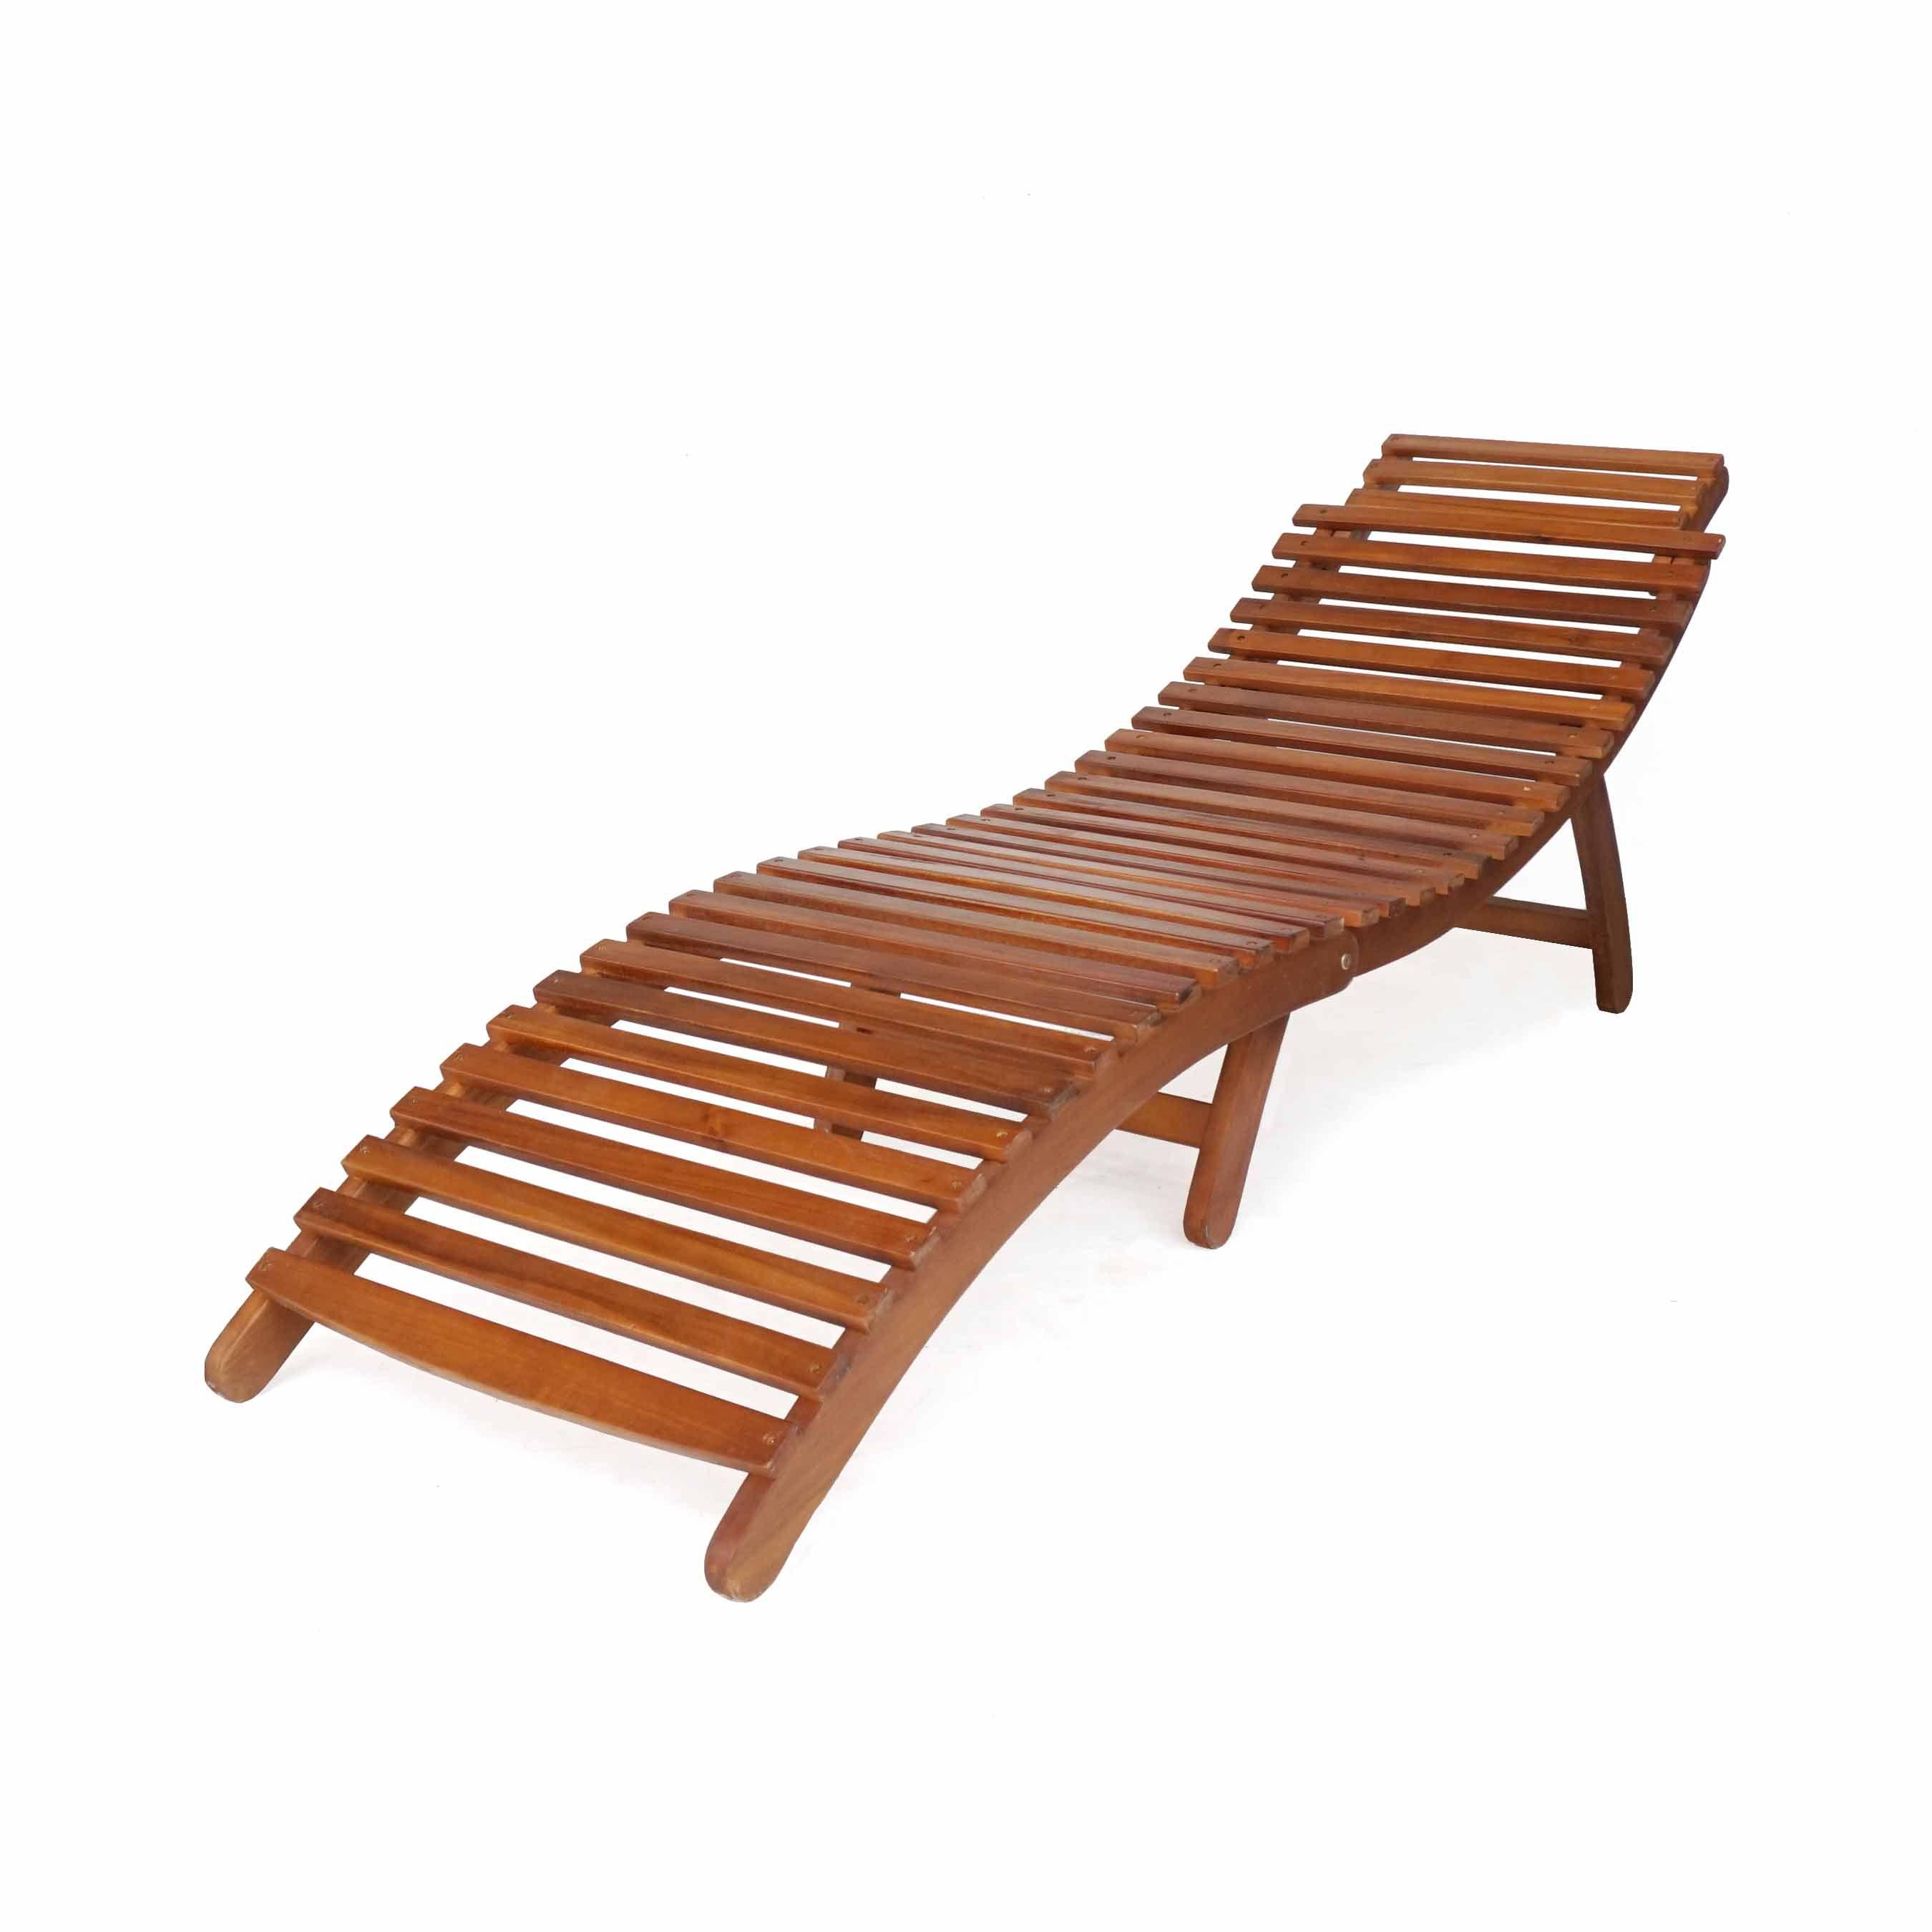 Buy luxo leven timber outdoor sun lounger online australia